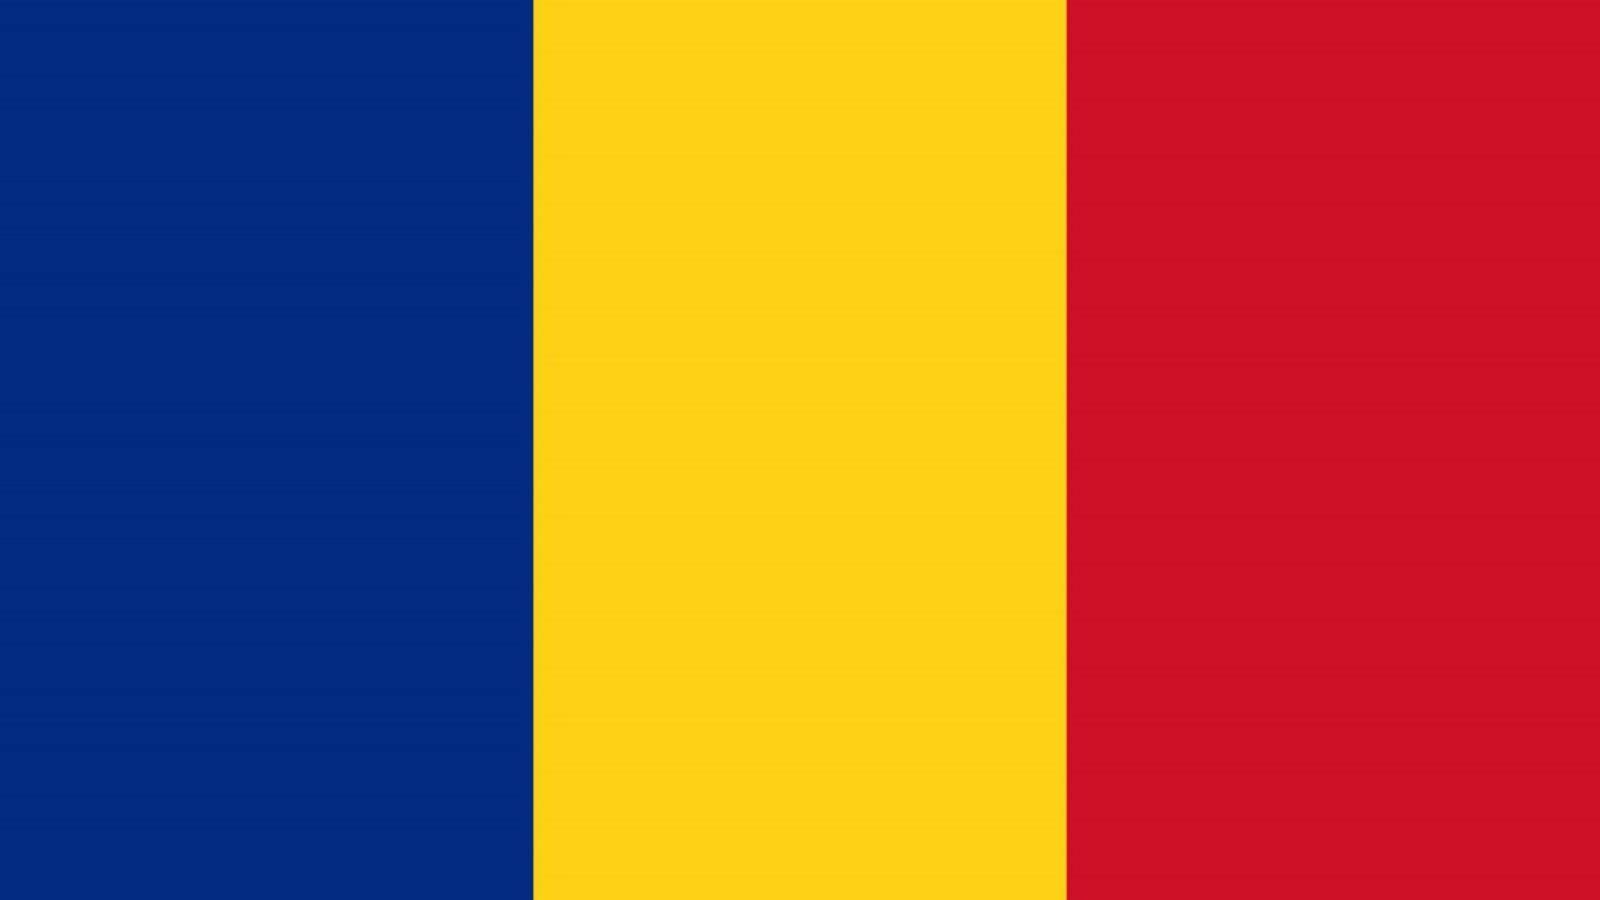 COVID-19: Cati Romani sunt Internati in Spitale din Cauza Bolii